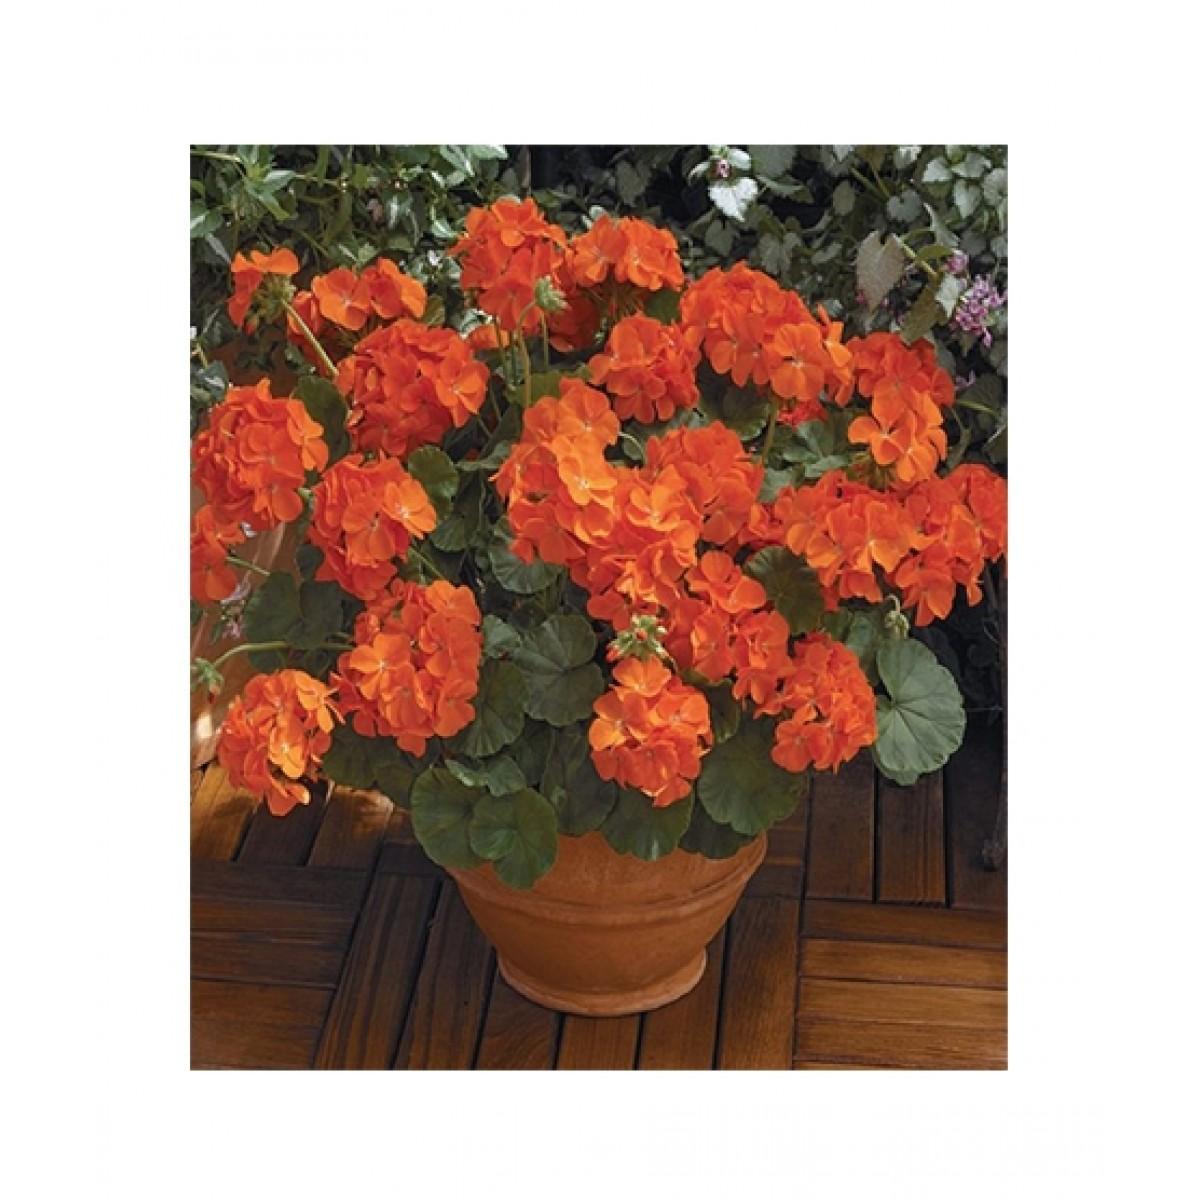 Husmah Geranium Maverick Flower Seeds Price In Pakistan Buy Husmah